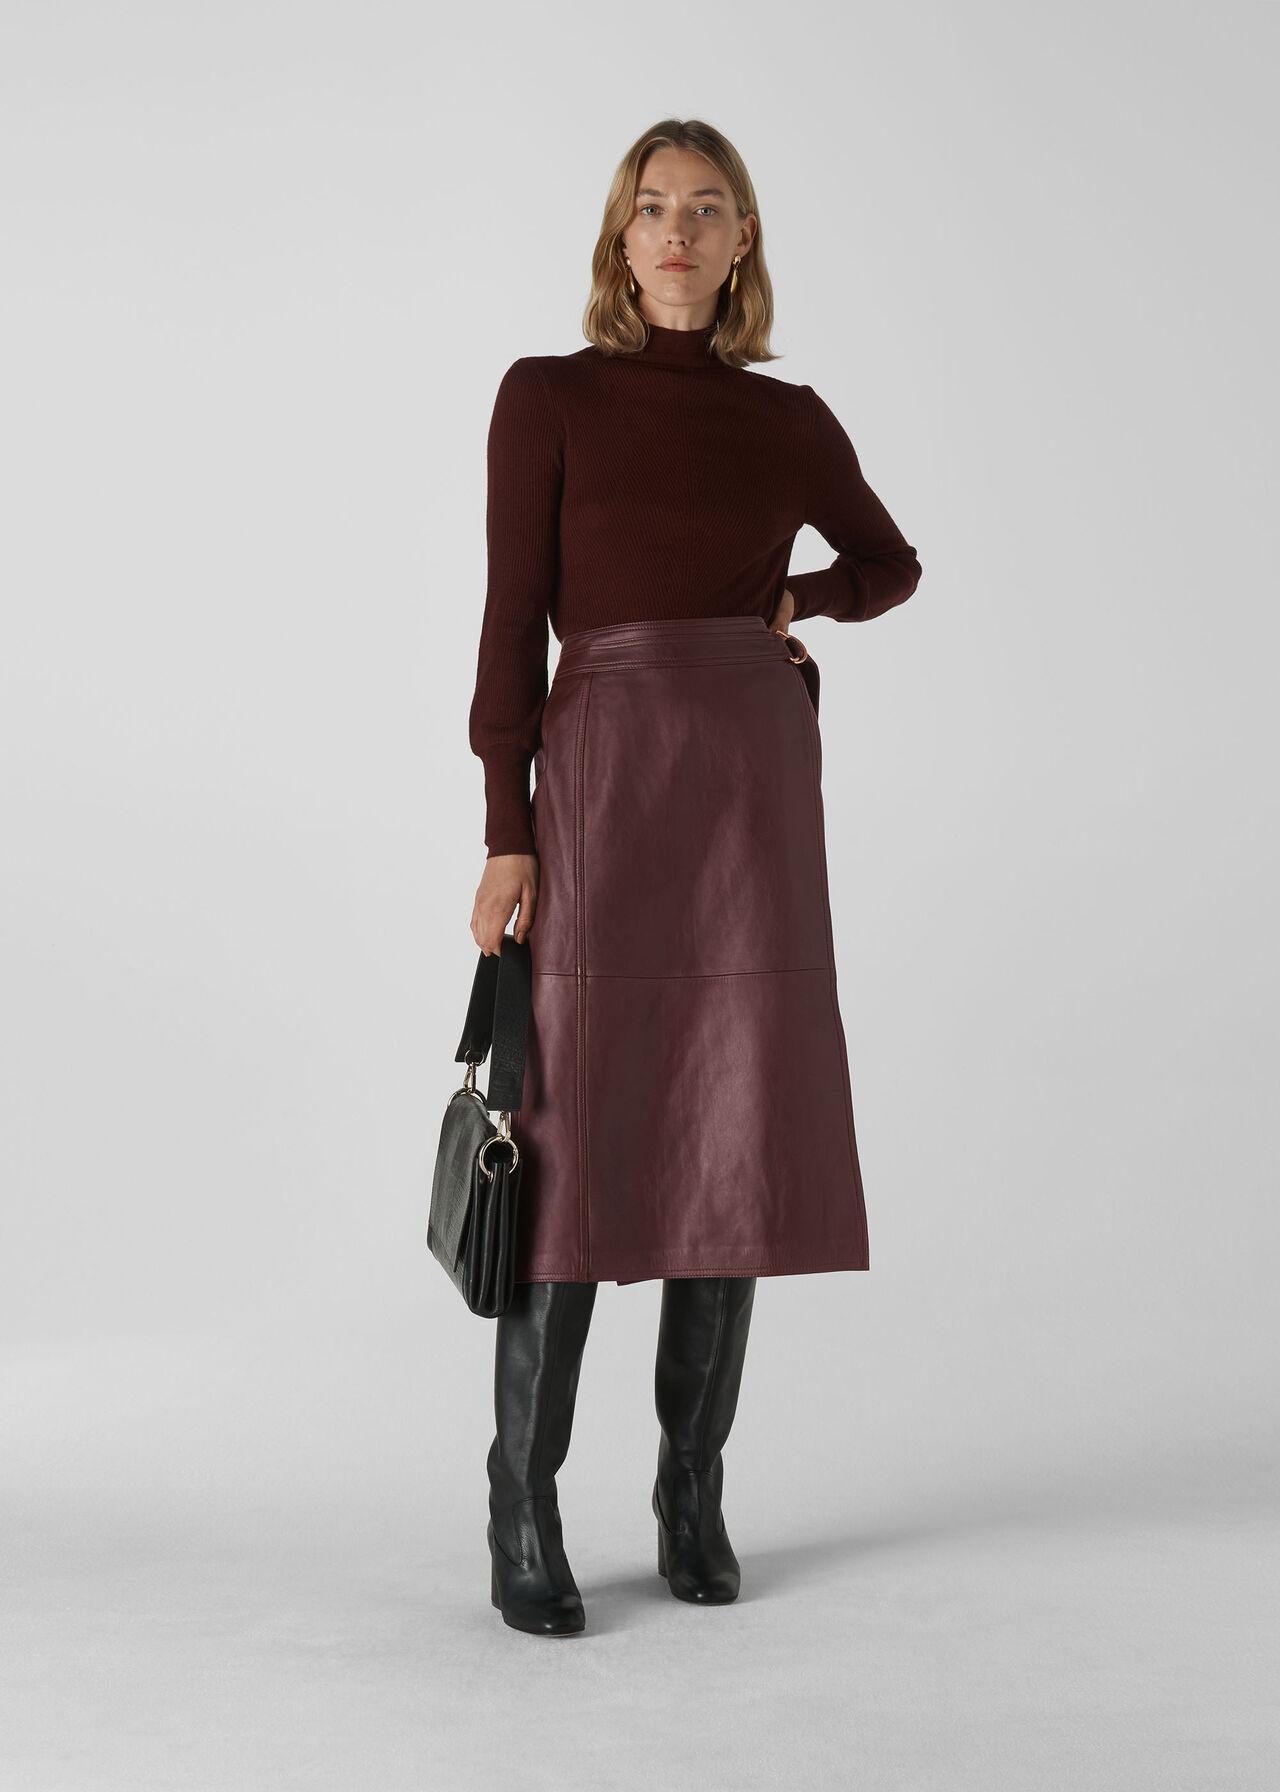 Selina Leather Wrap Skirt Burgundy